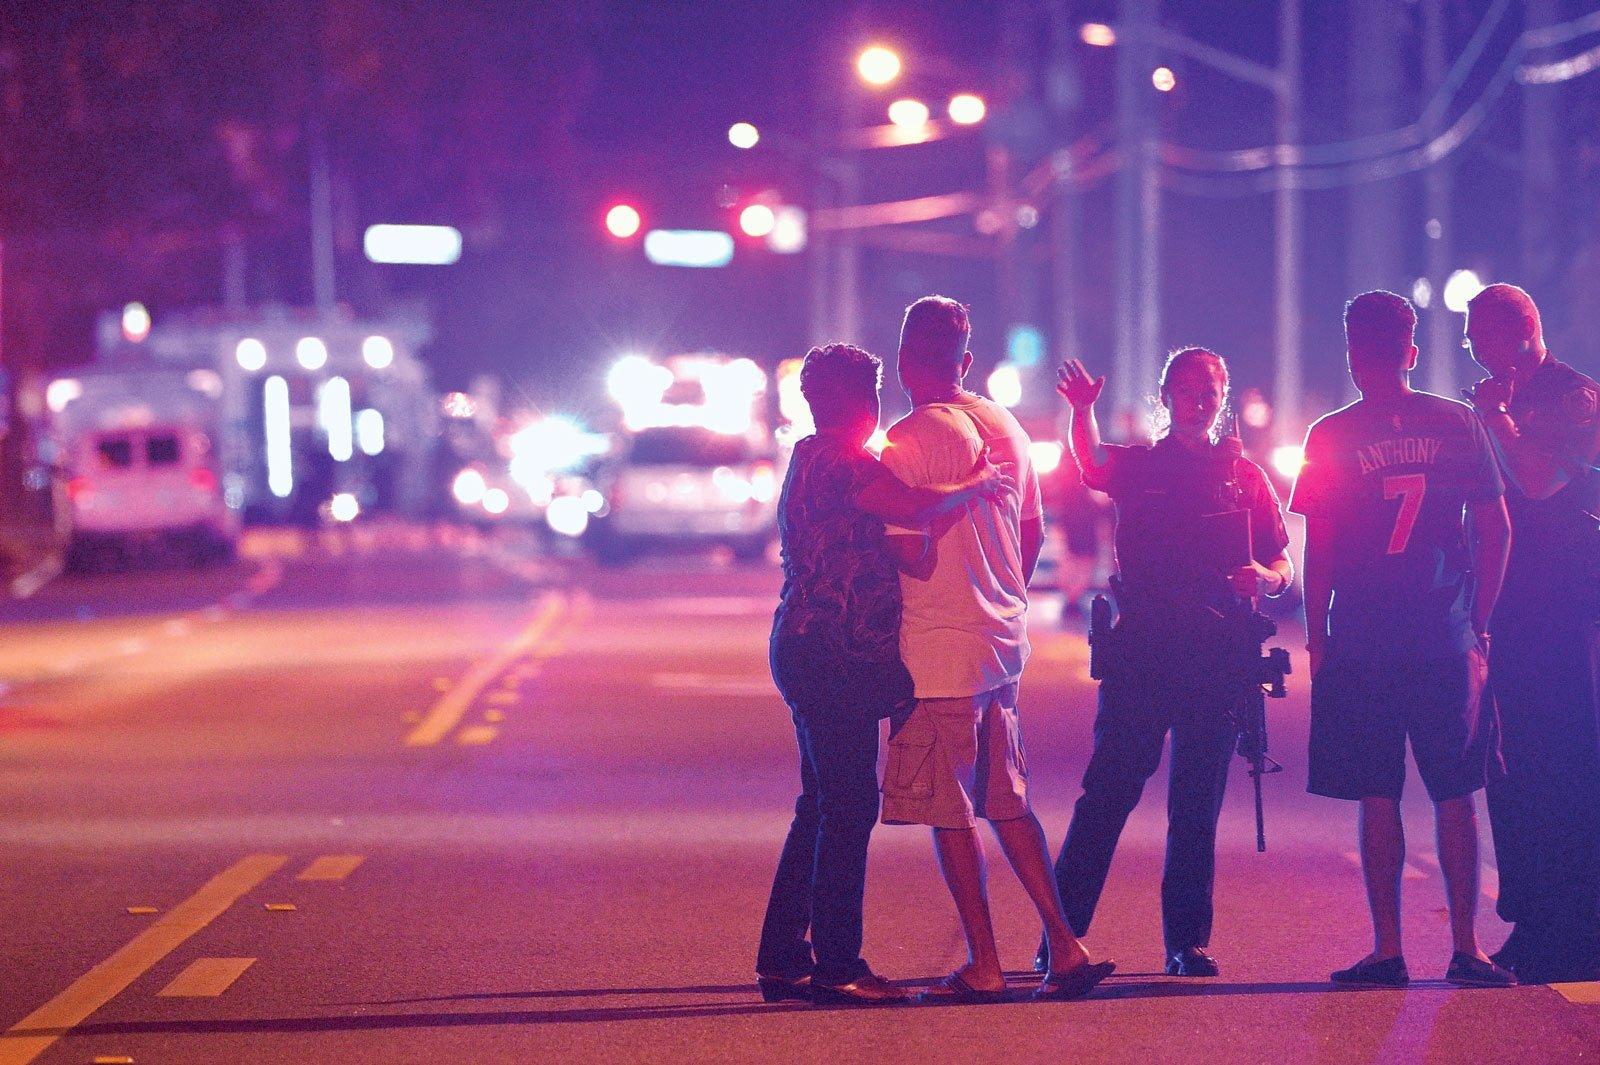 Orlando shooting of 2016 | Timeline, Motive, Deaths, & Facts | Britannica